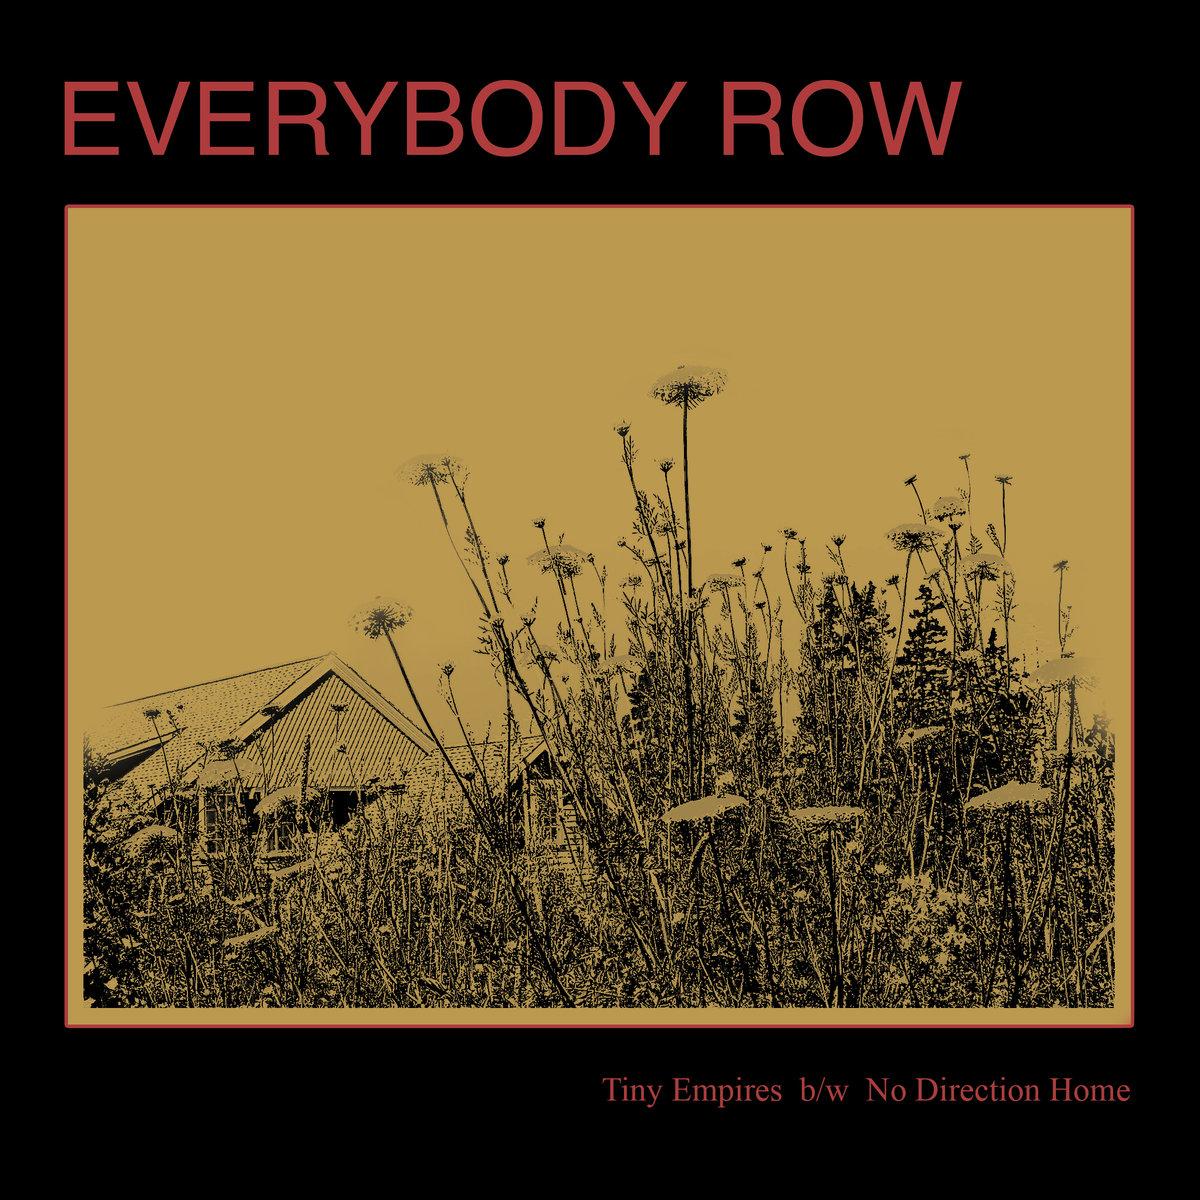 Everybody Row - Tiny Empires Digital EP